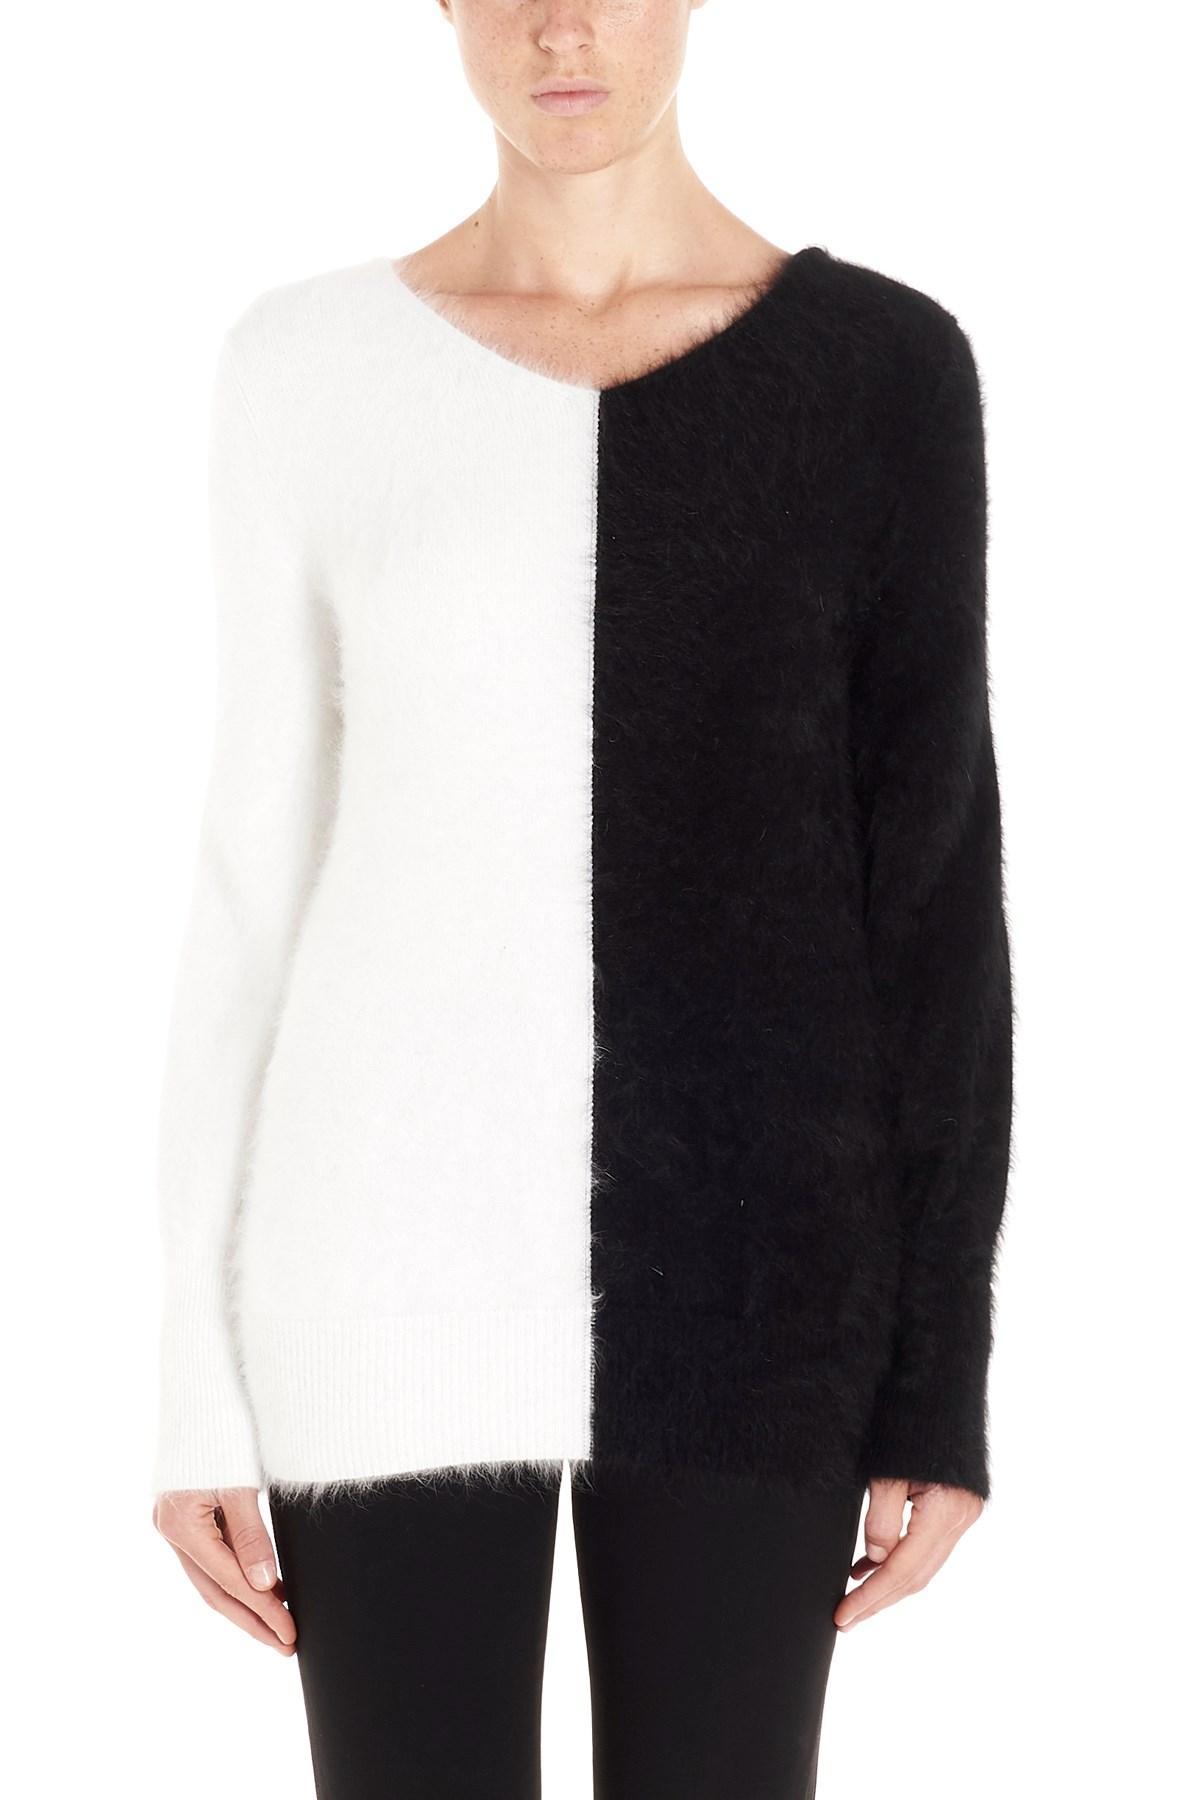 competitive price 63ba4 2e7a8 'Cassandra' sweater